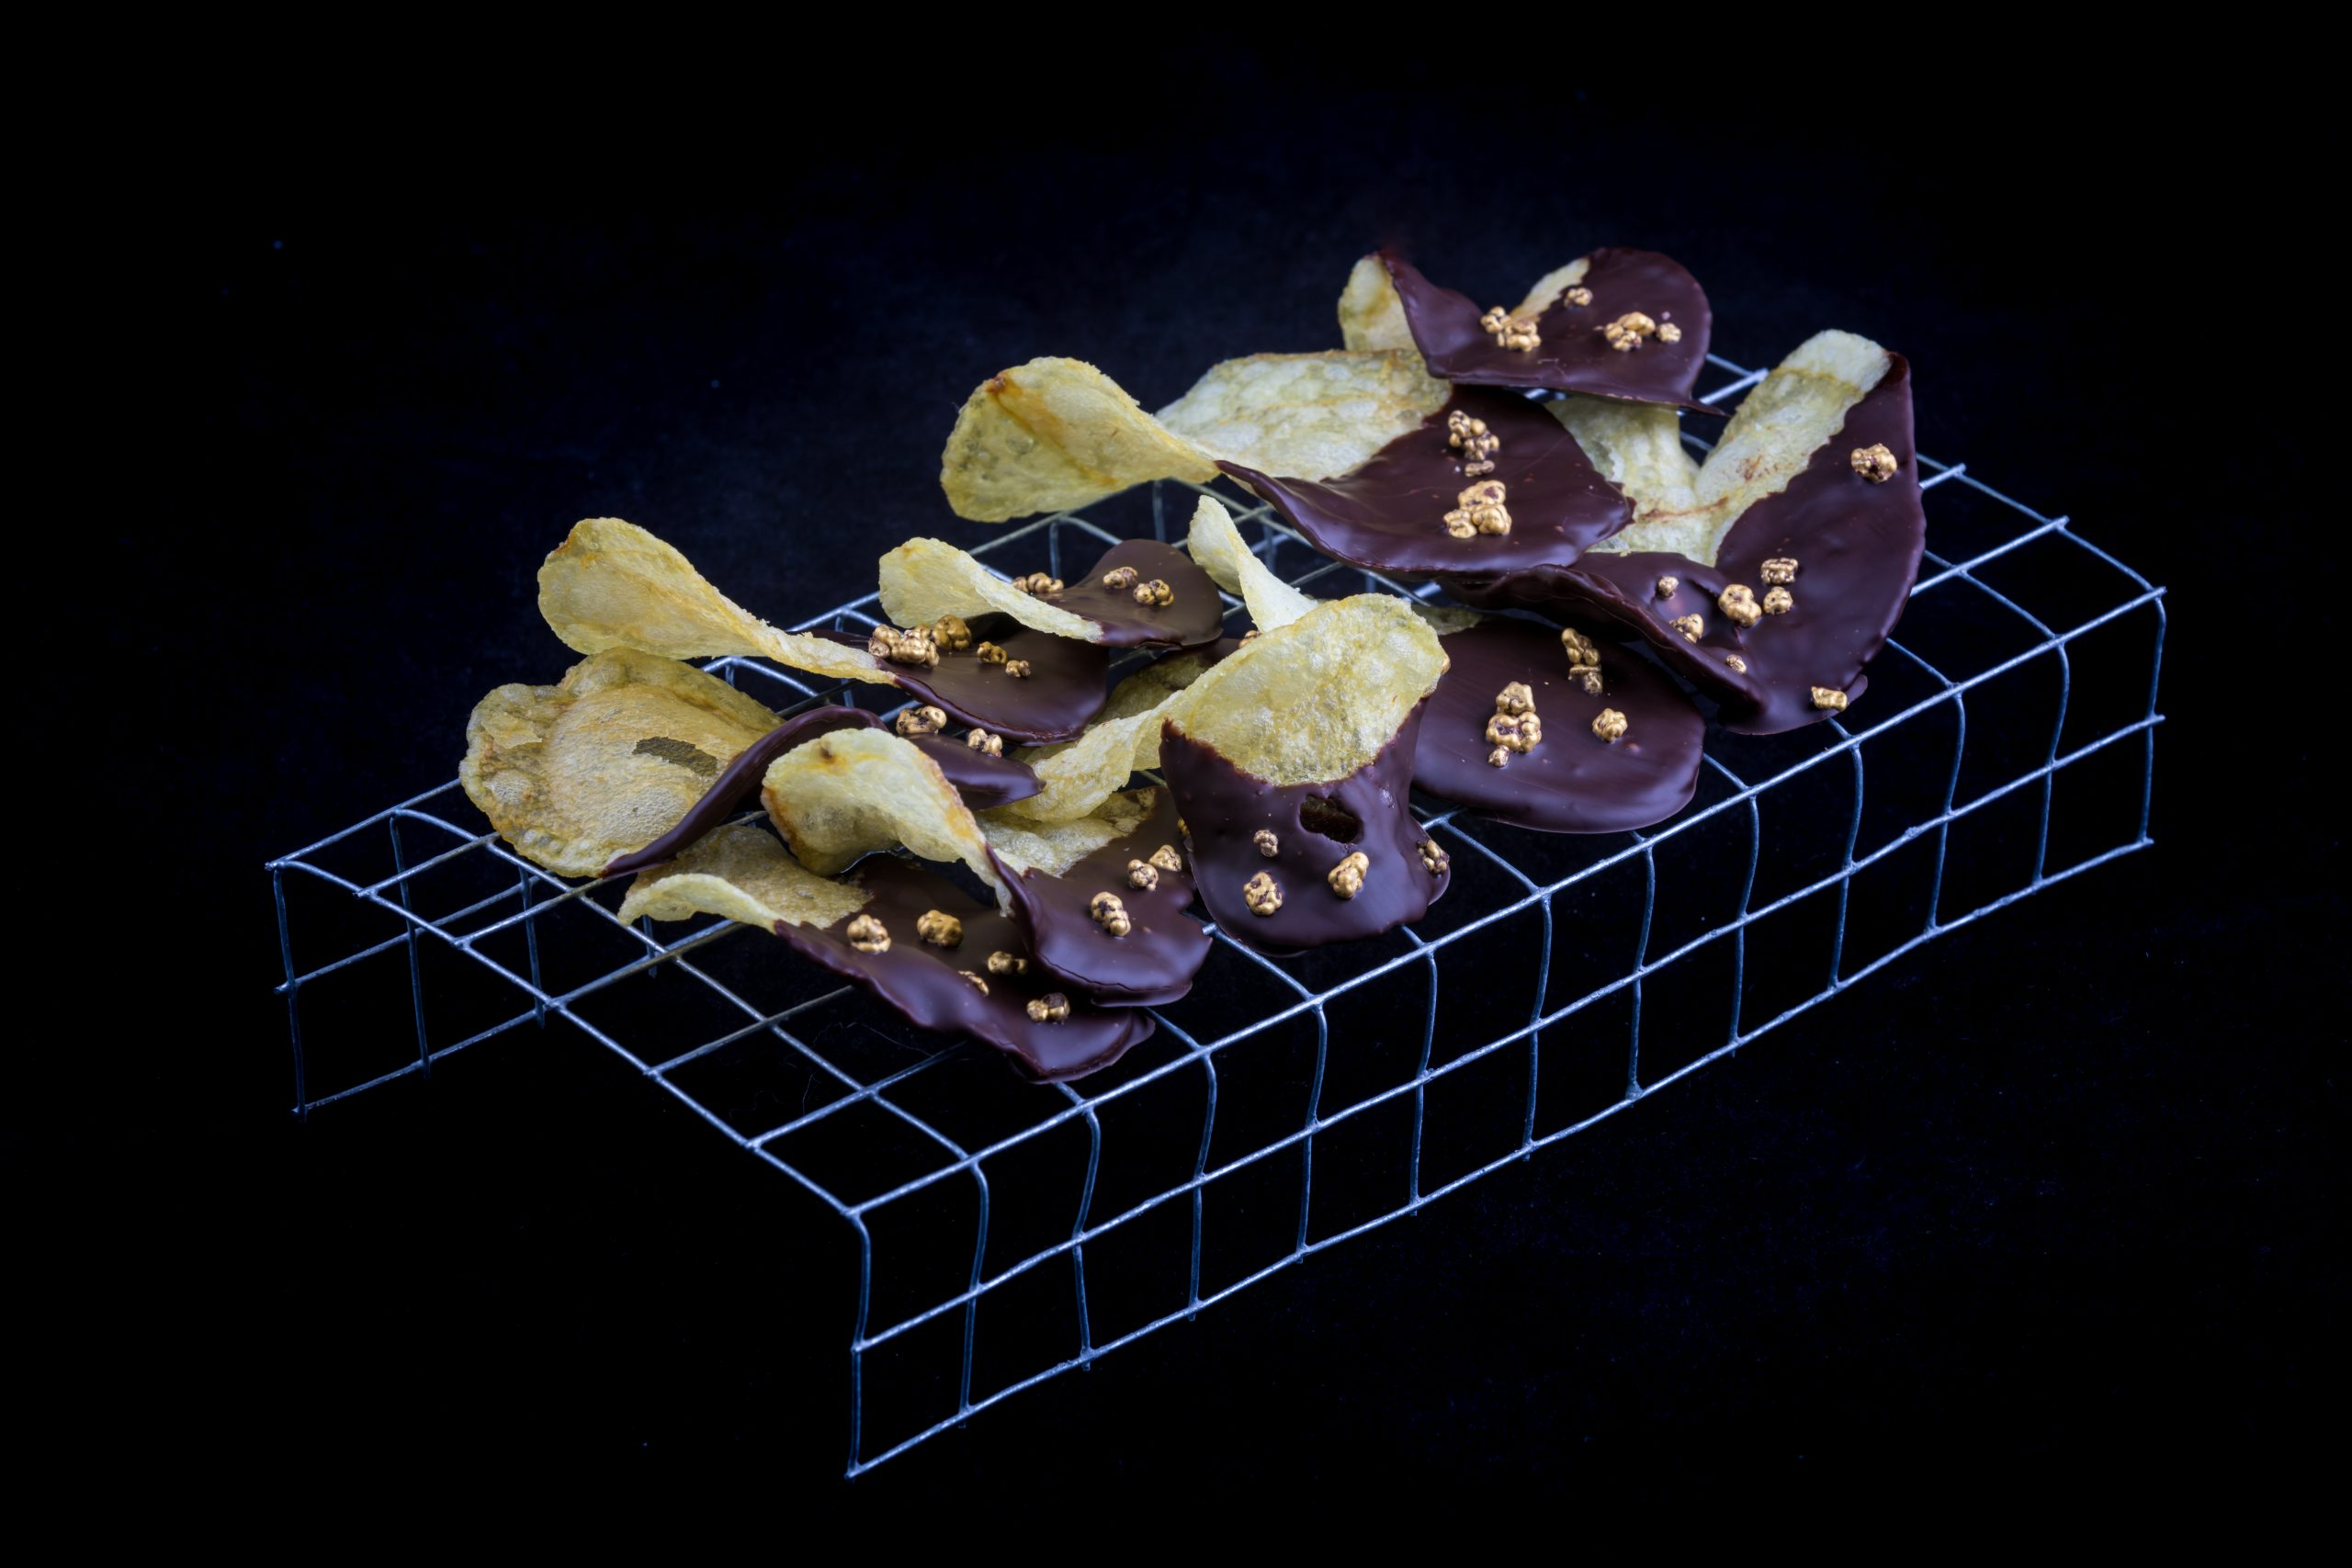 Patatas bañadas en chocolate